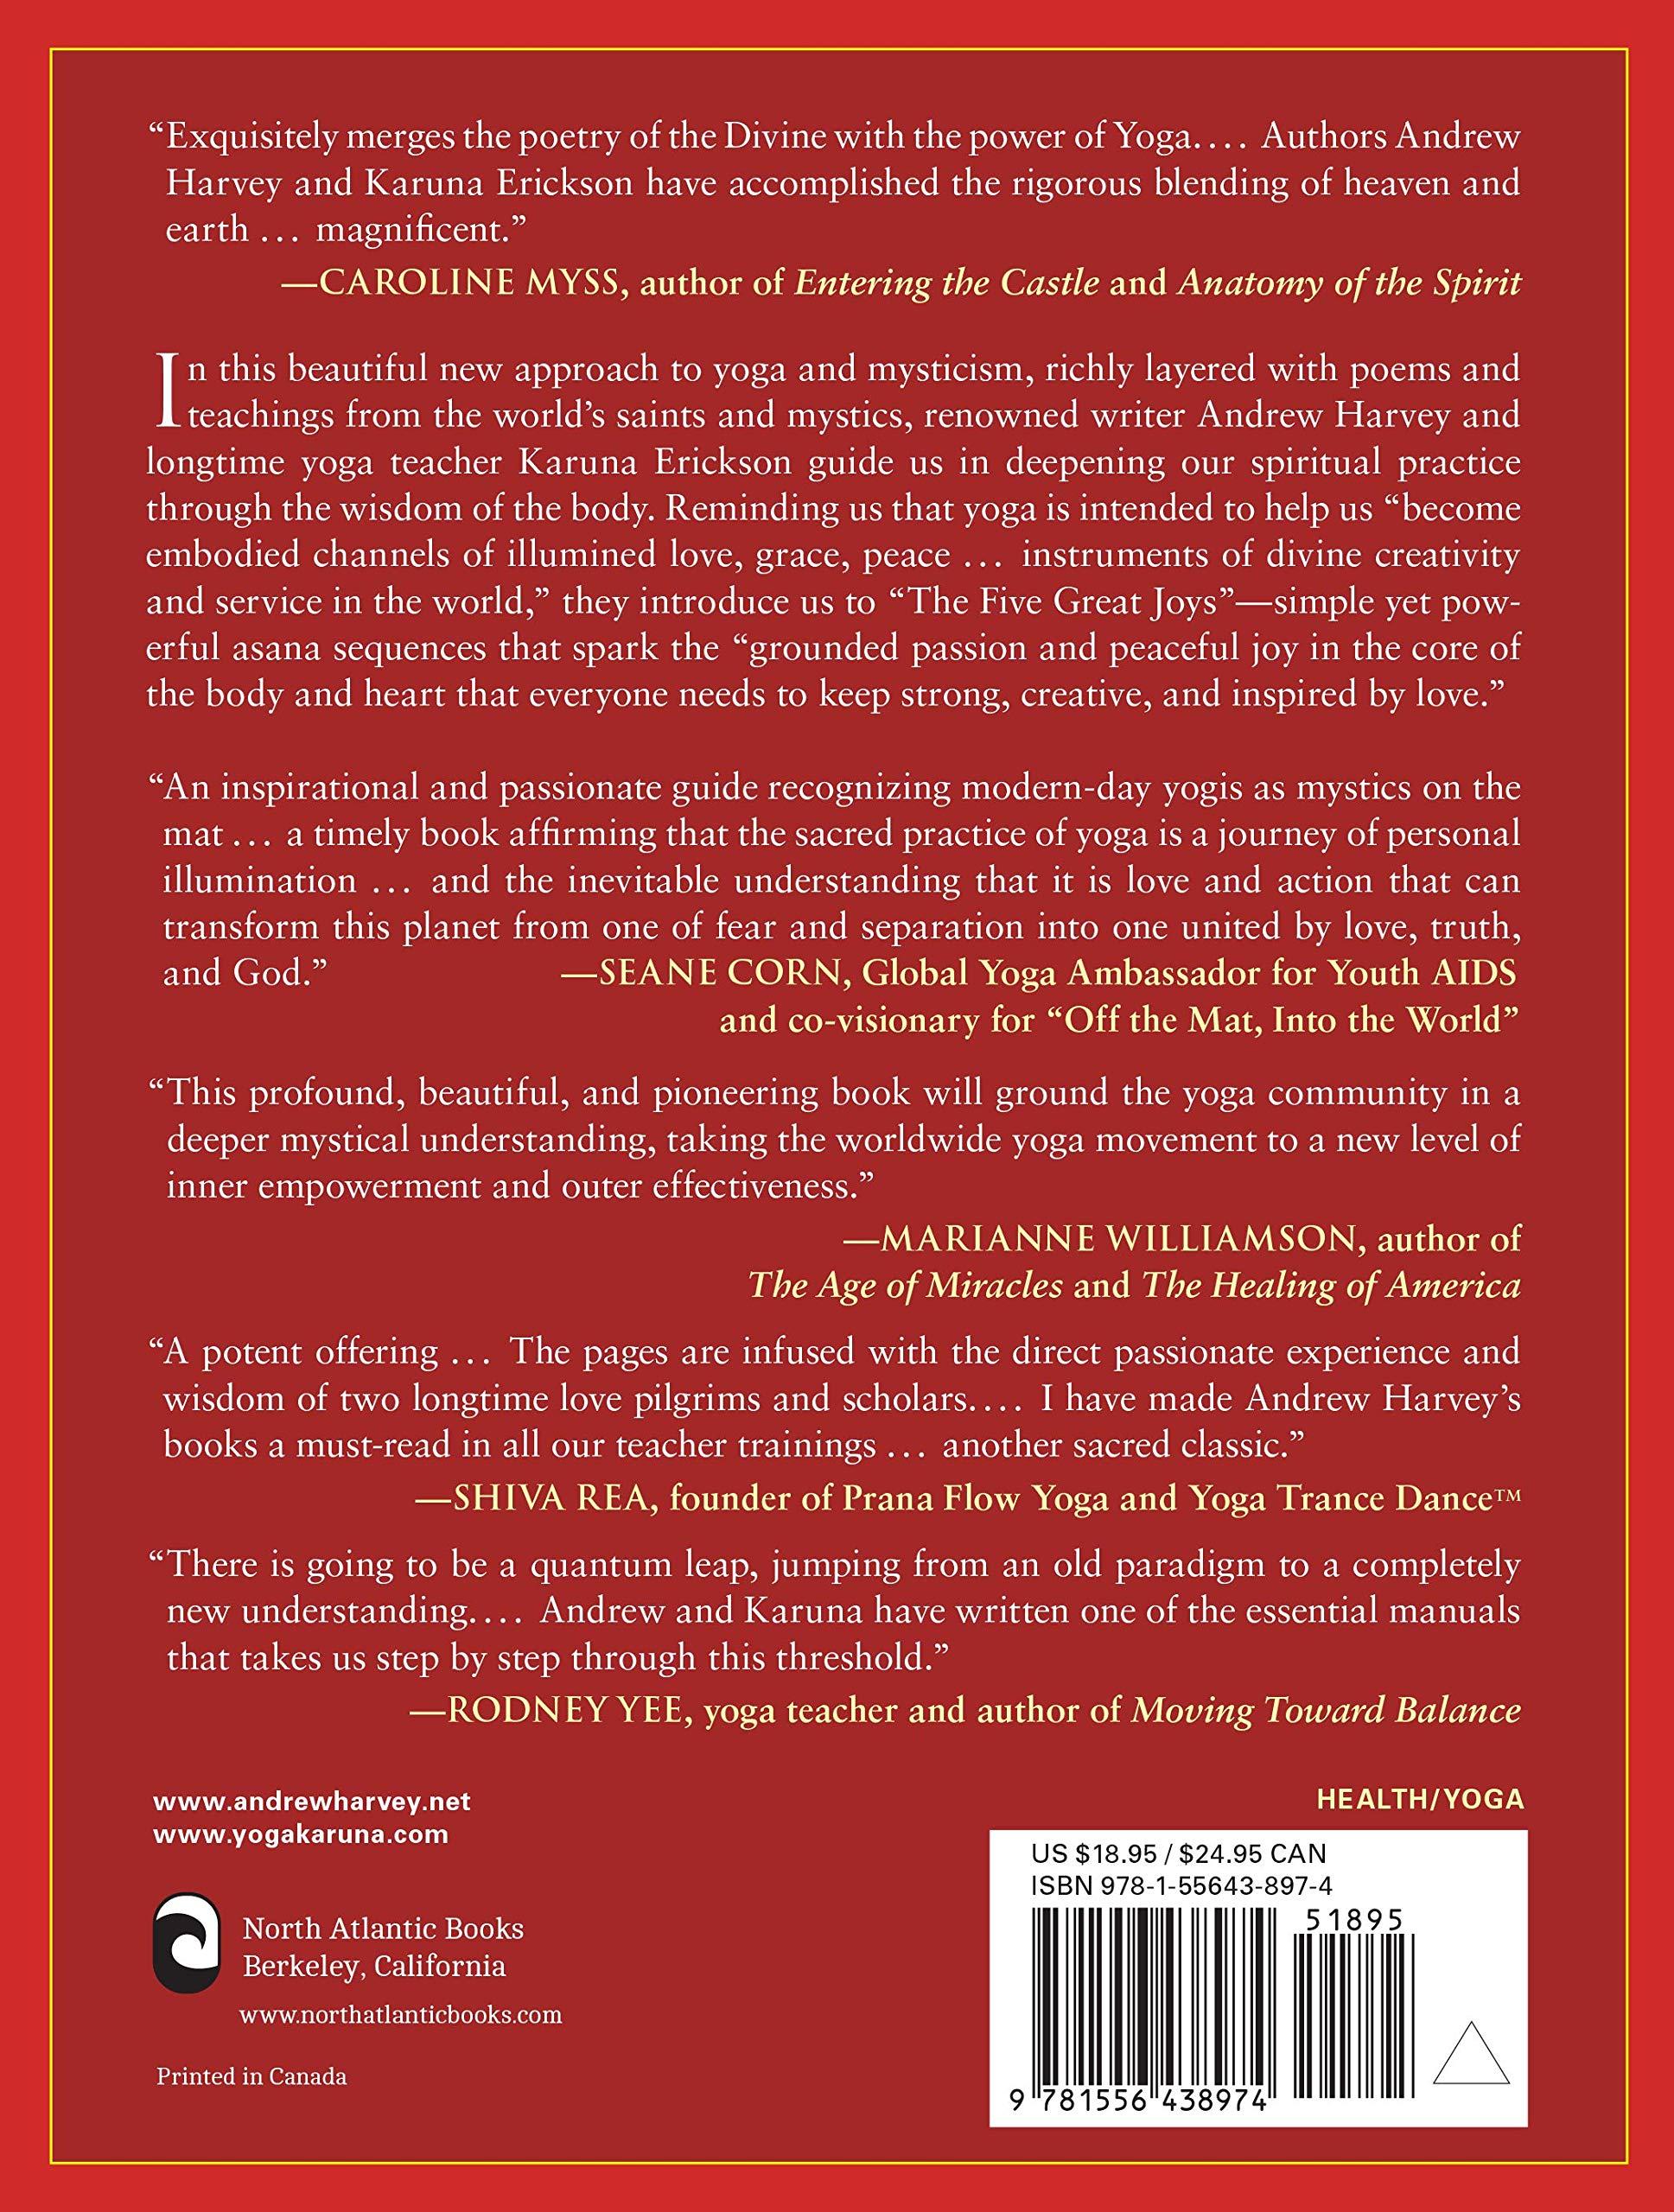 Heart Yoga: Amazon.es: Andrew Harvey, Karuna Erickson ...